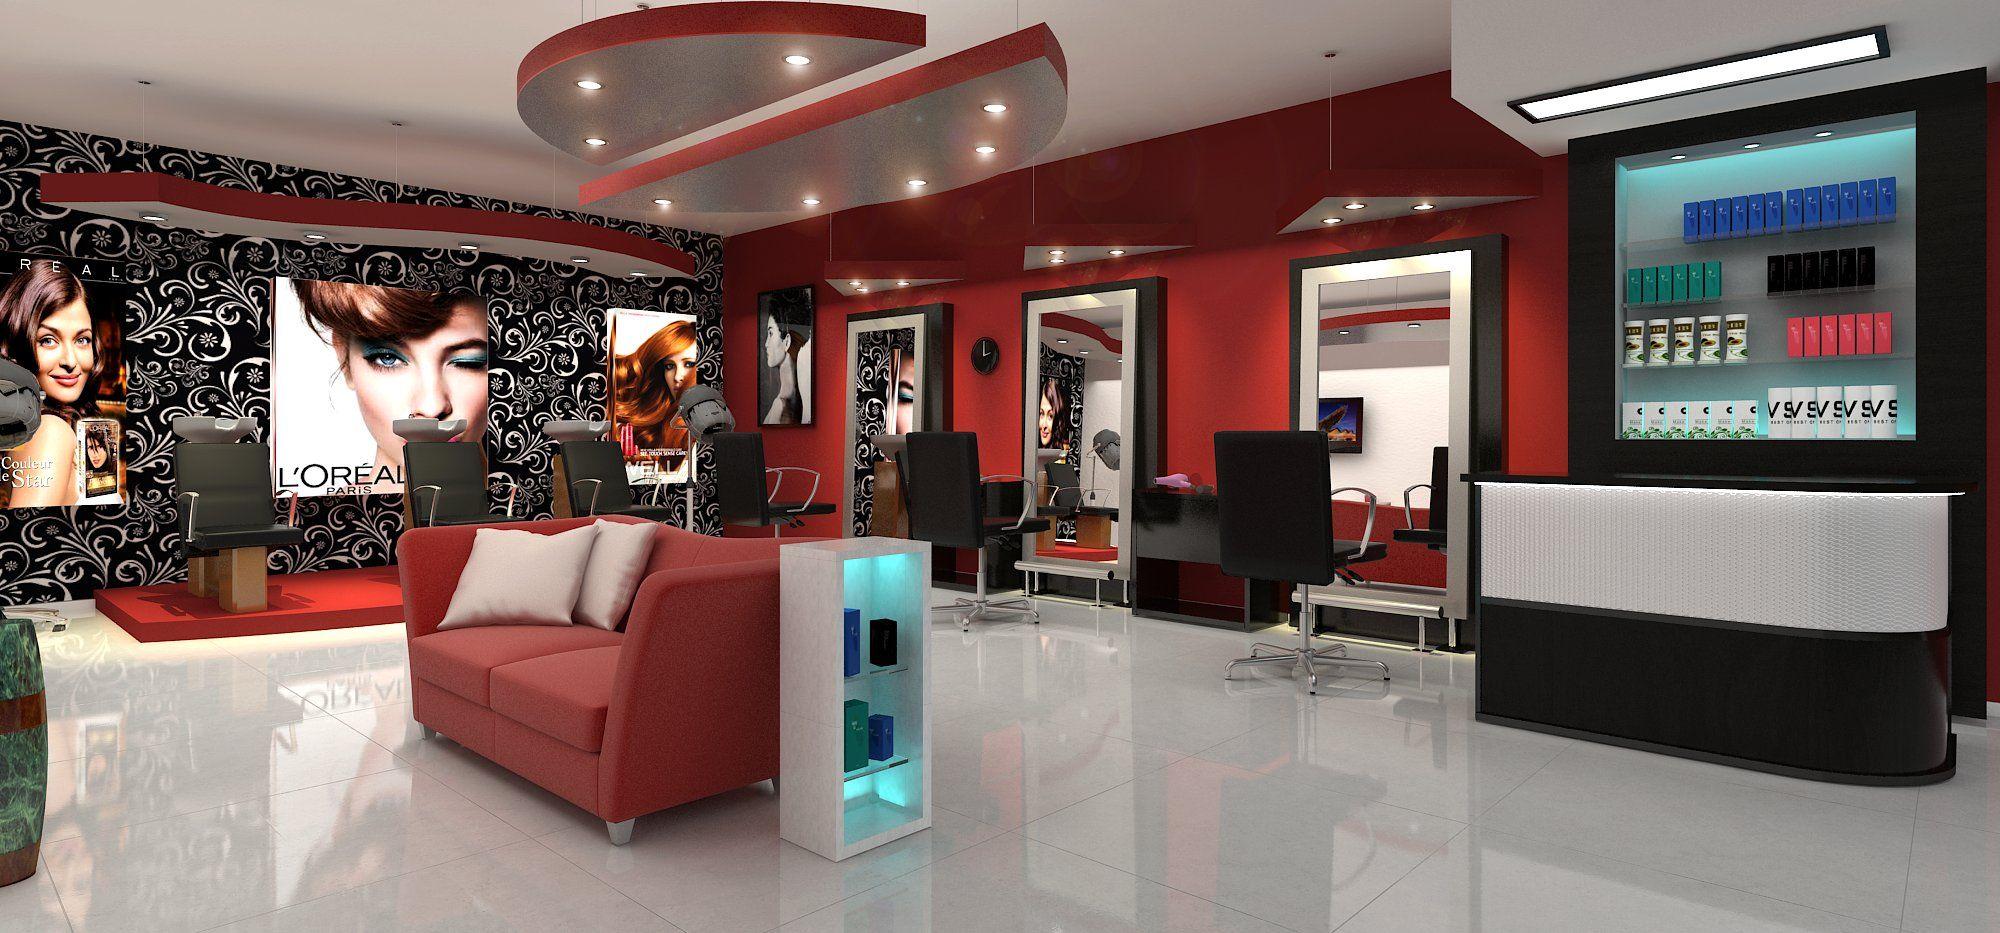 Resultado de imagen de dise o de salon de peluqueria - Salon de diseno ...